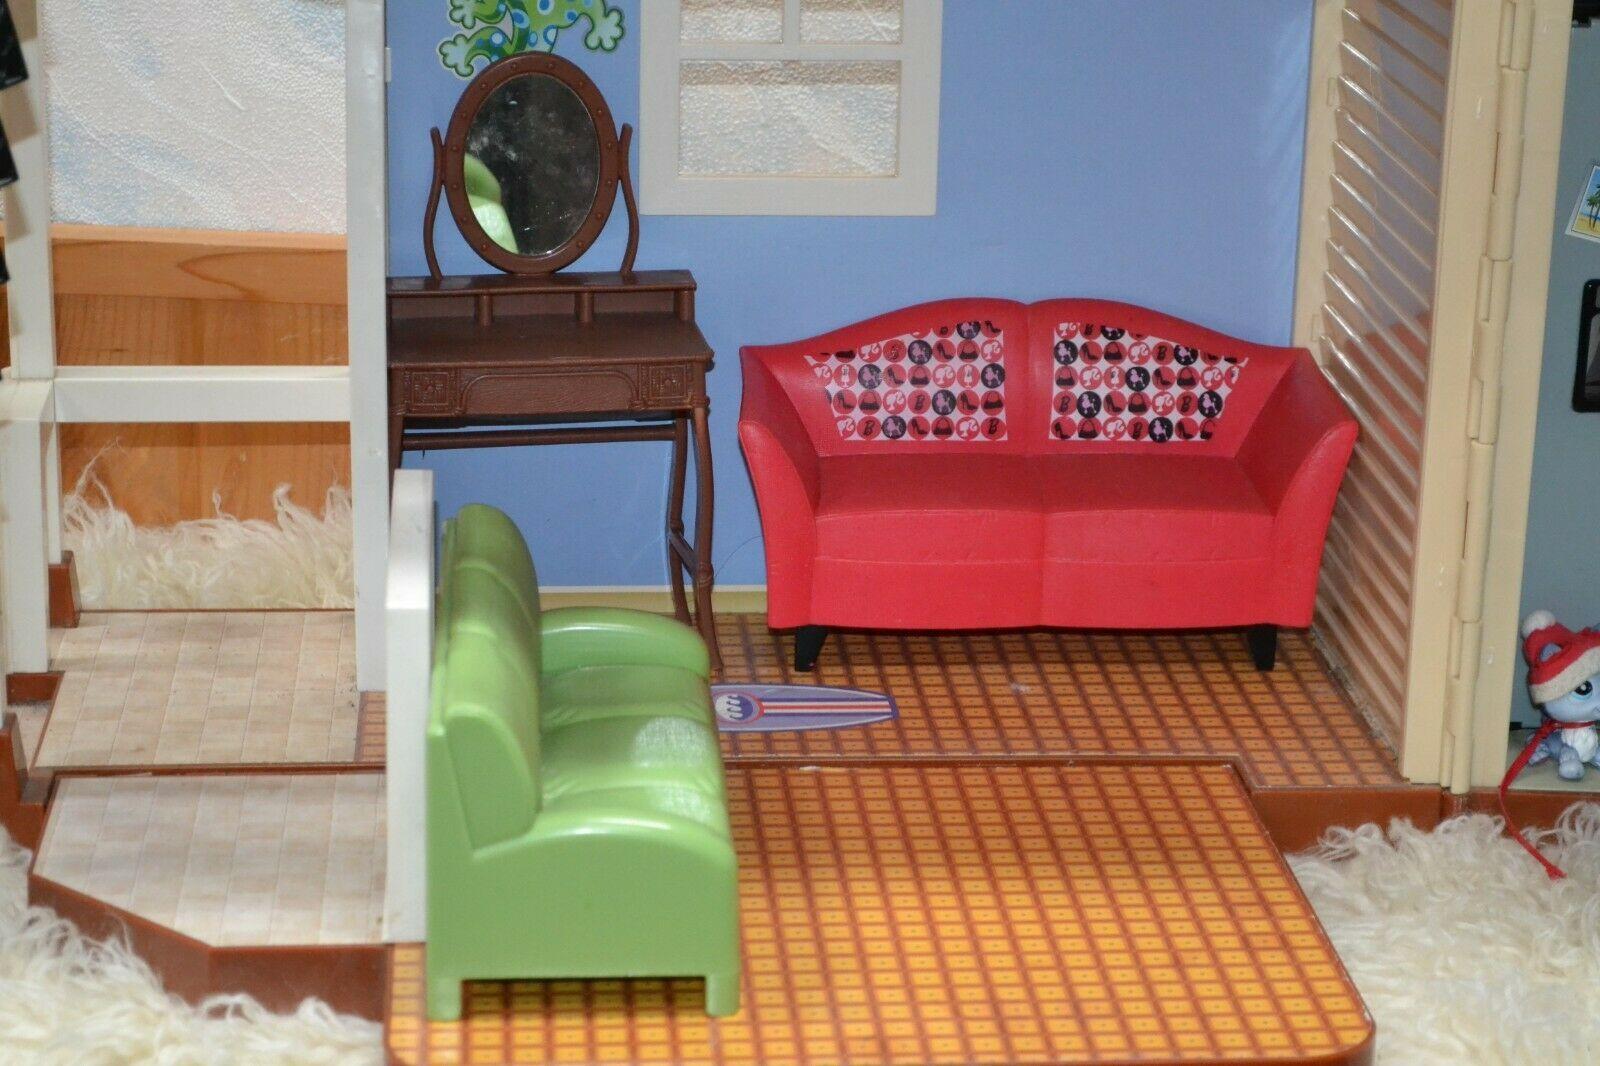 Disney Dollhouse - Hannah Montana Malibu Beach house incl. Furniture, dog & more